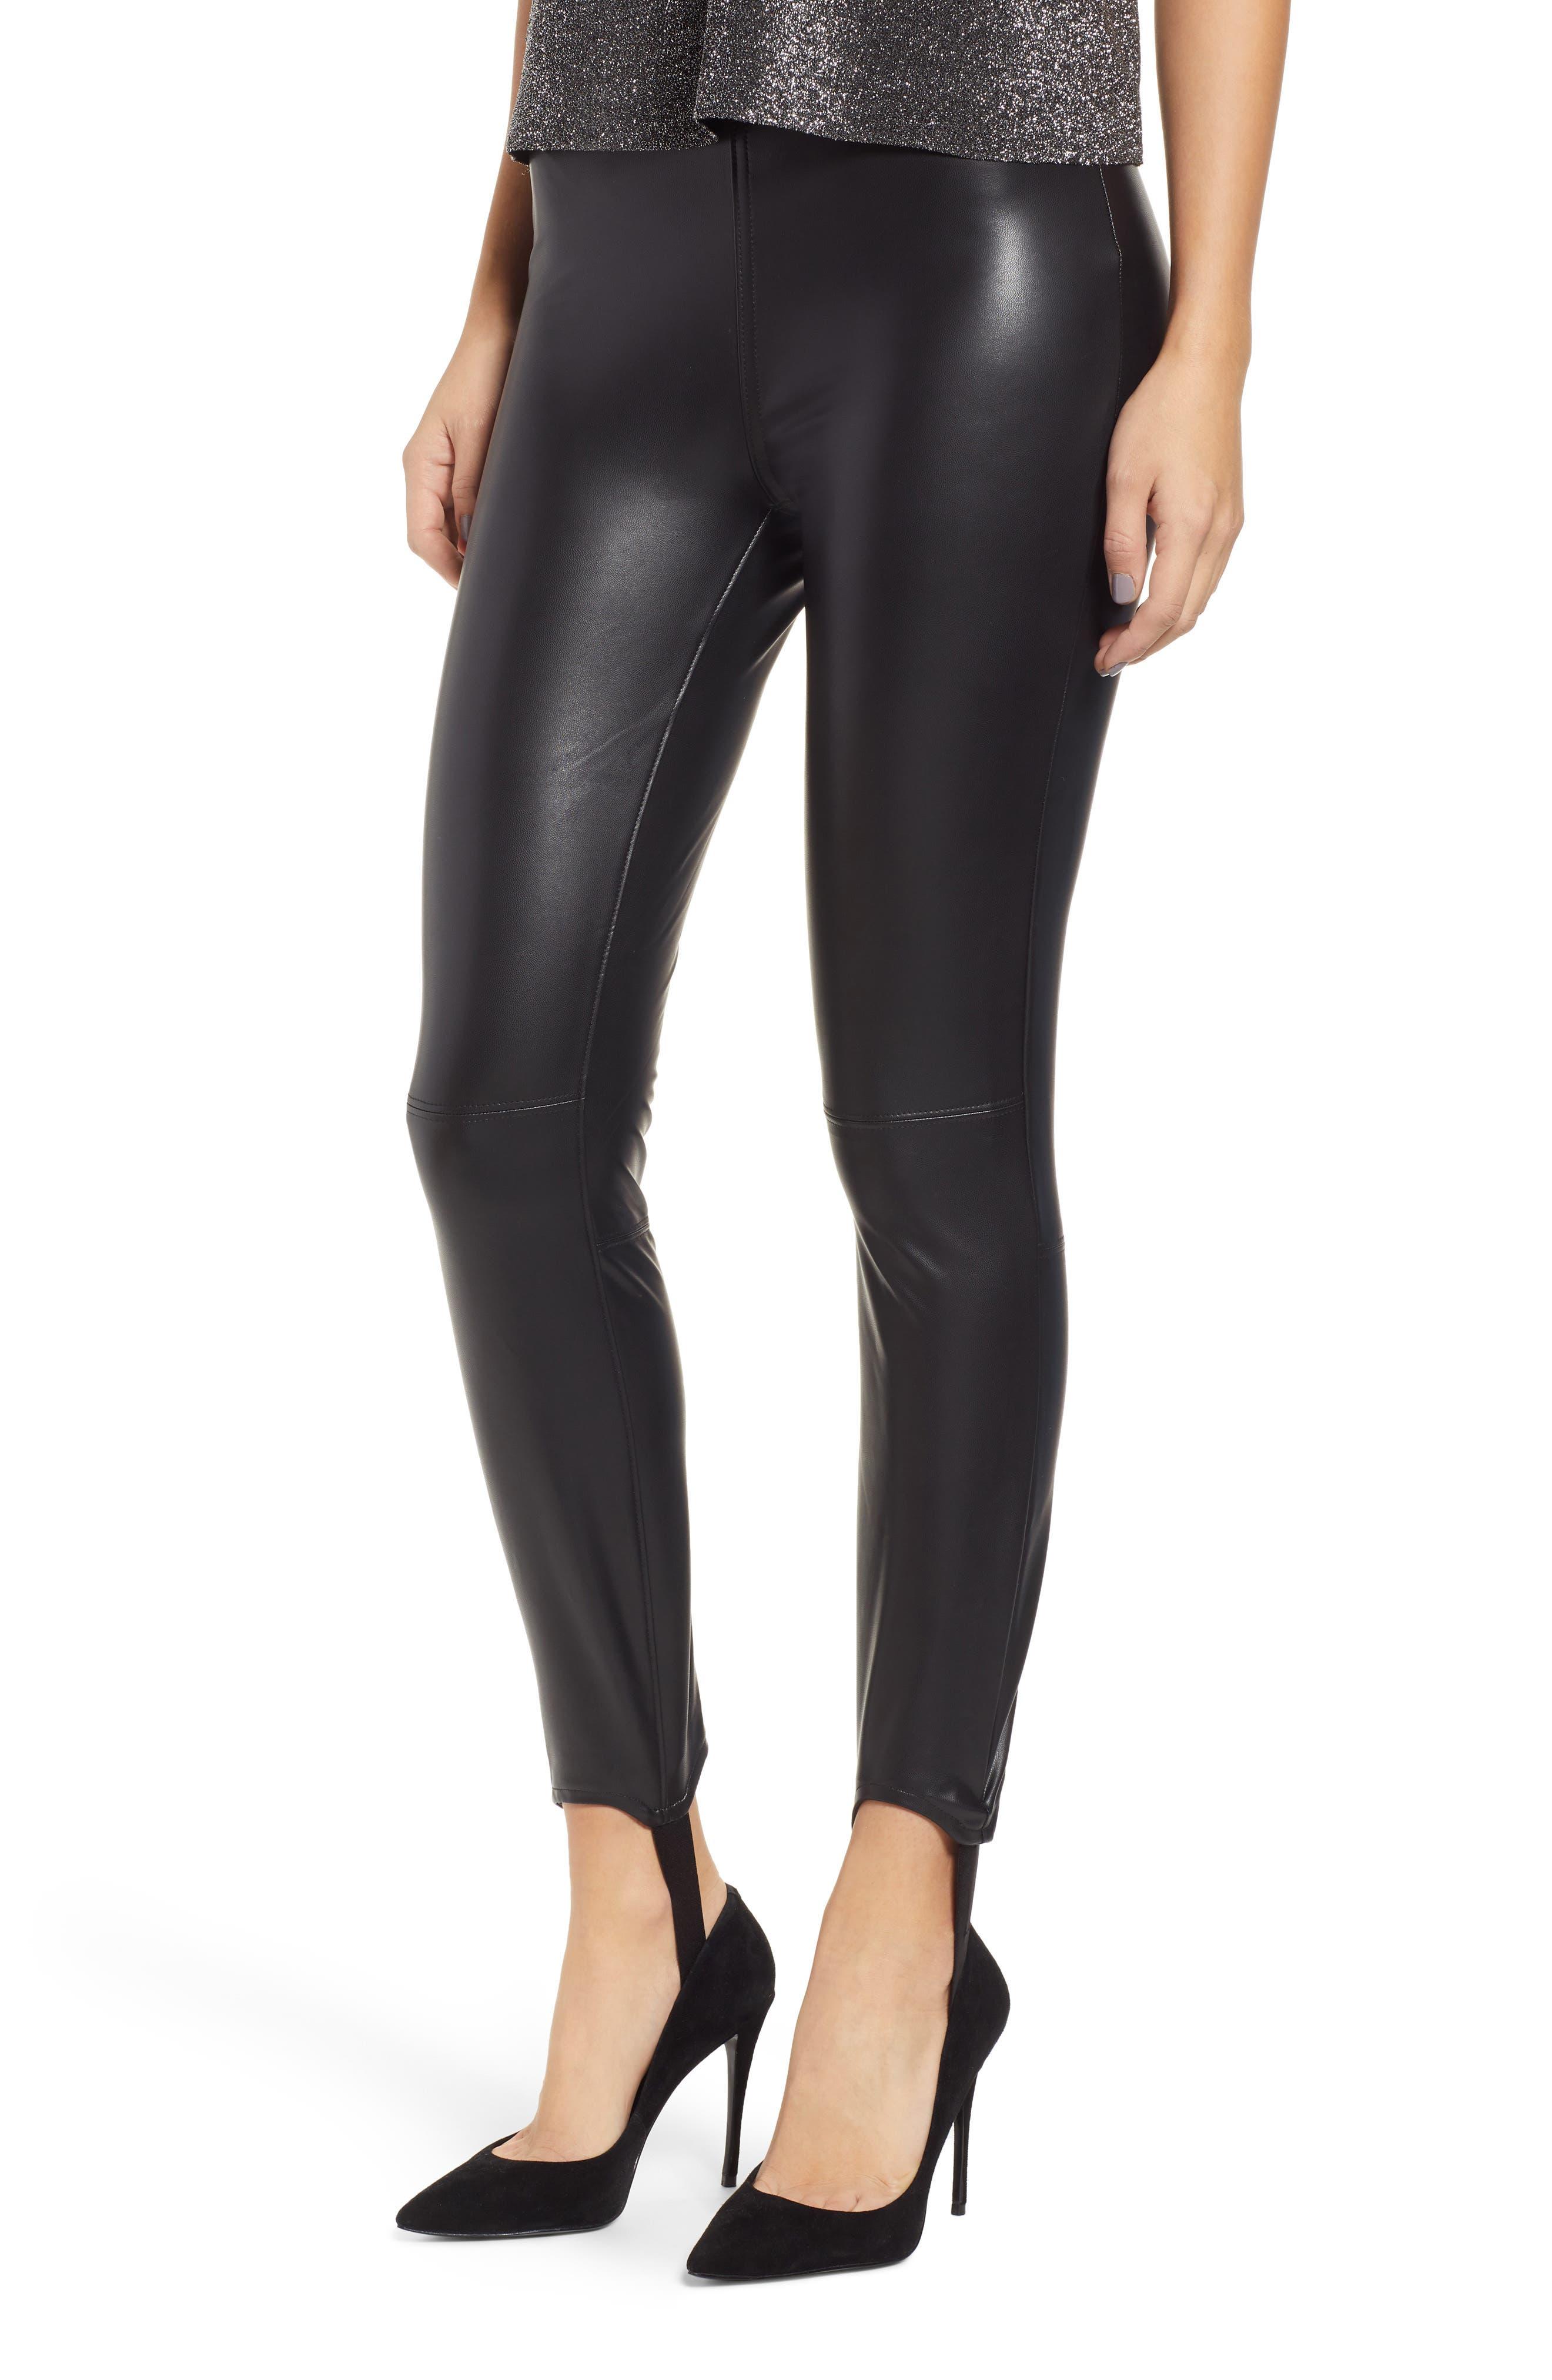 Blanknyc Faux Leather Stirrup Leggings, Black